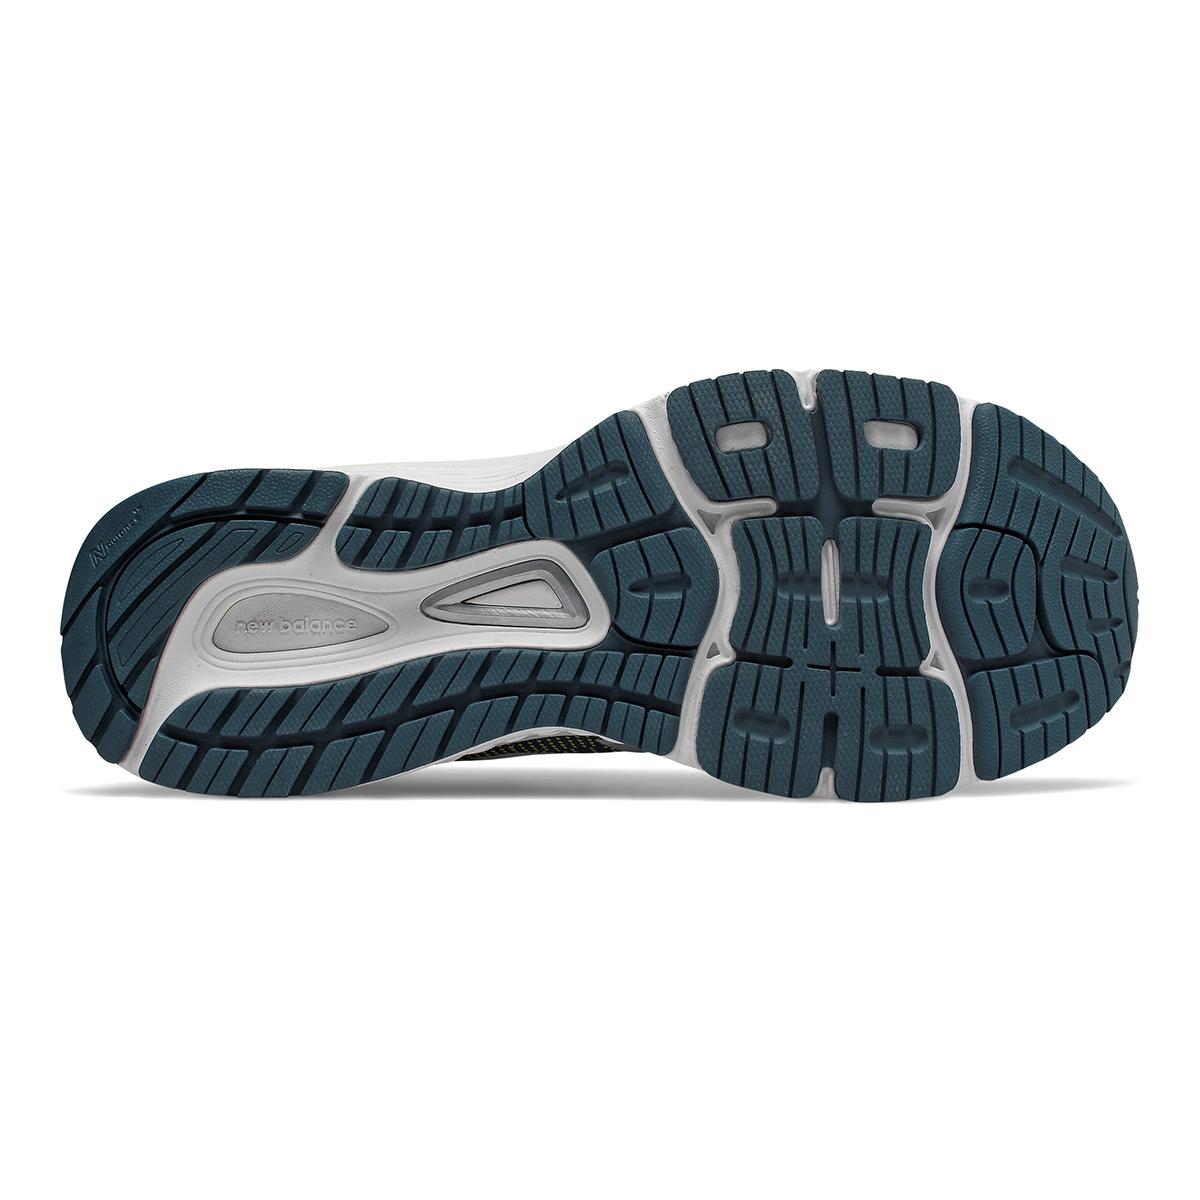 Men's New Balance 880V9 Running Shoe - Color: Supercell / Orion Blue / Sulphur Yellow (Regular Width) - Size: 8.5, Supercell / Orion Blue / Sulphur Yellow, large, image 3